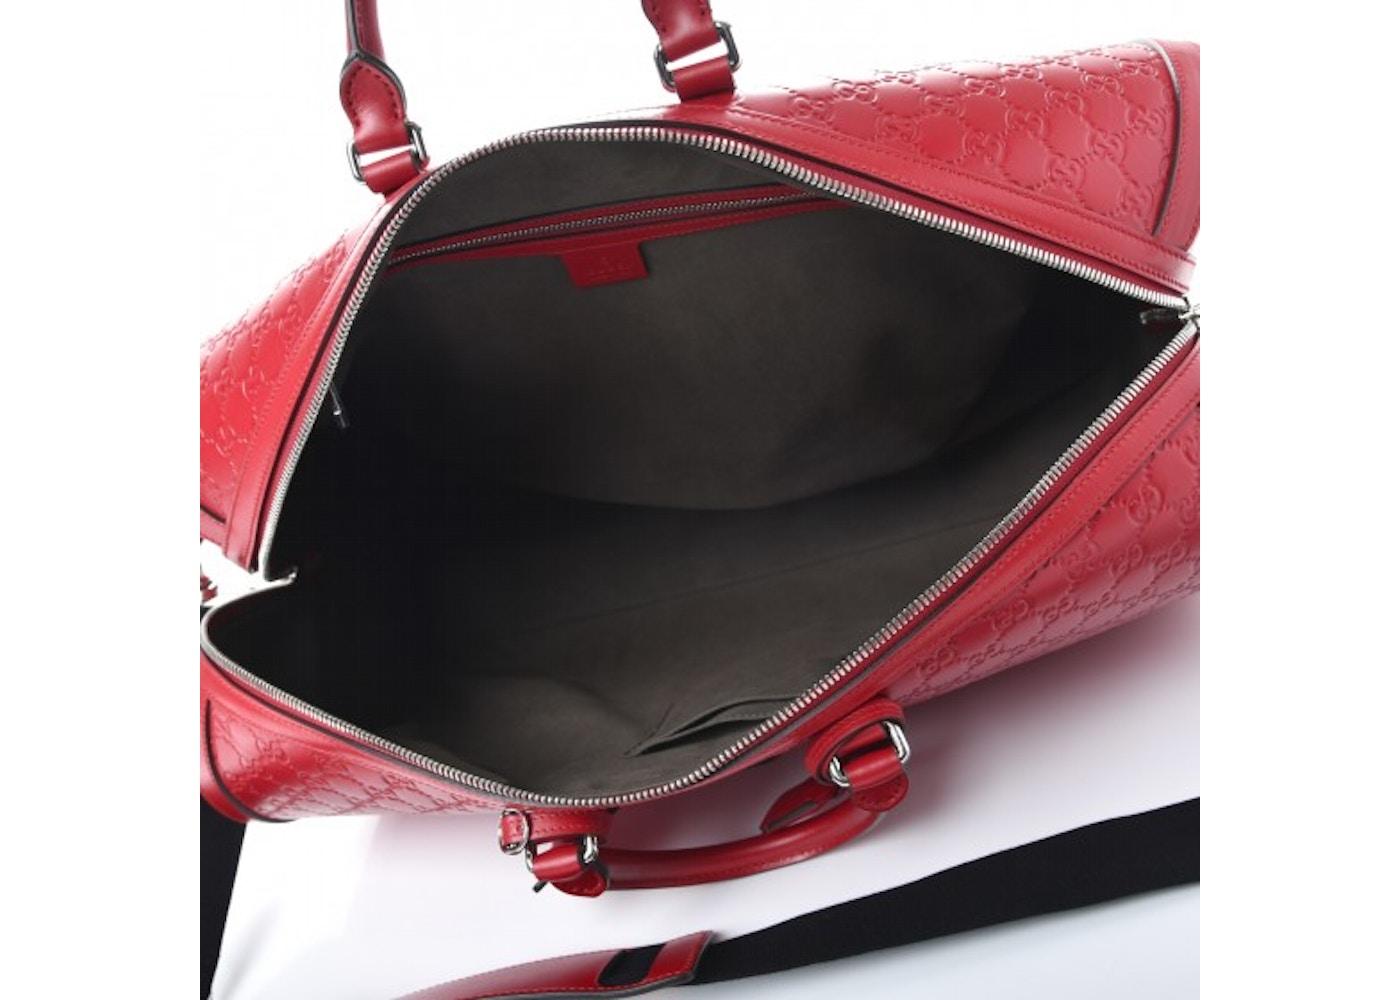 b0f696ced296 Buy & Sell Gucci Other Handbags - Highest Bid